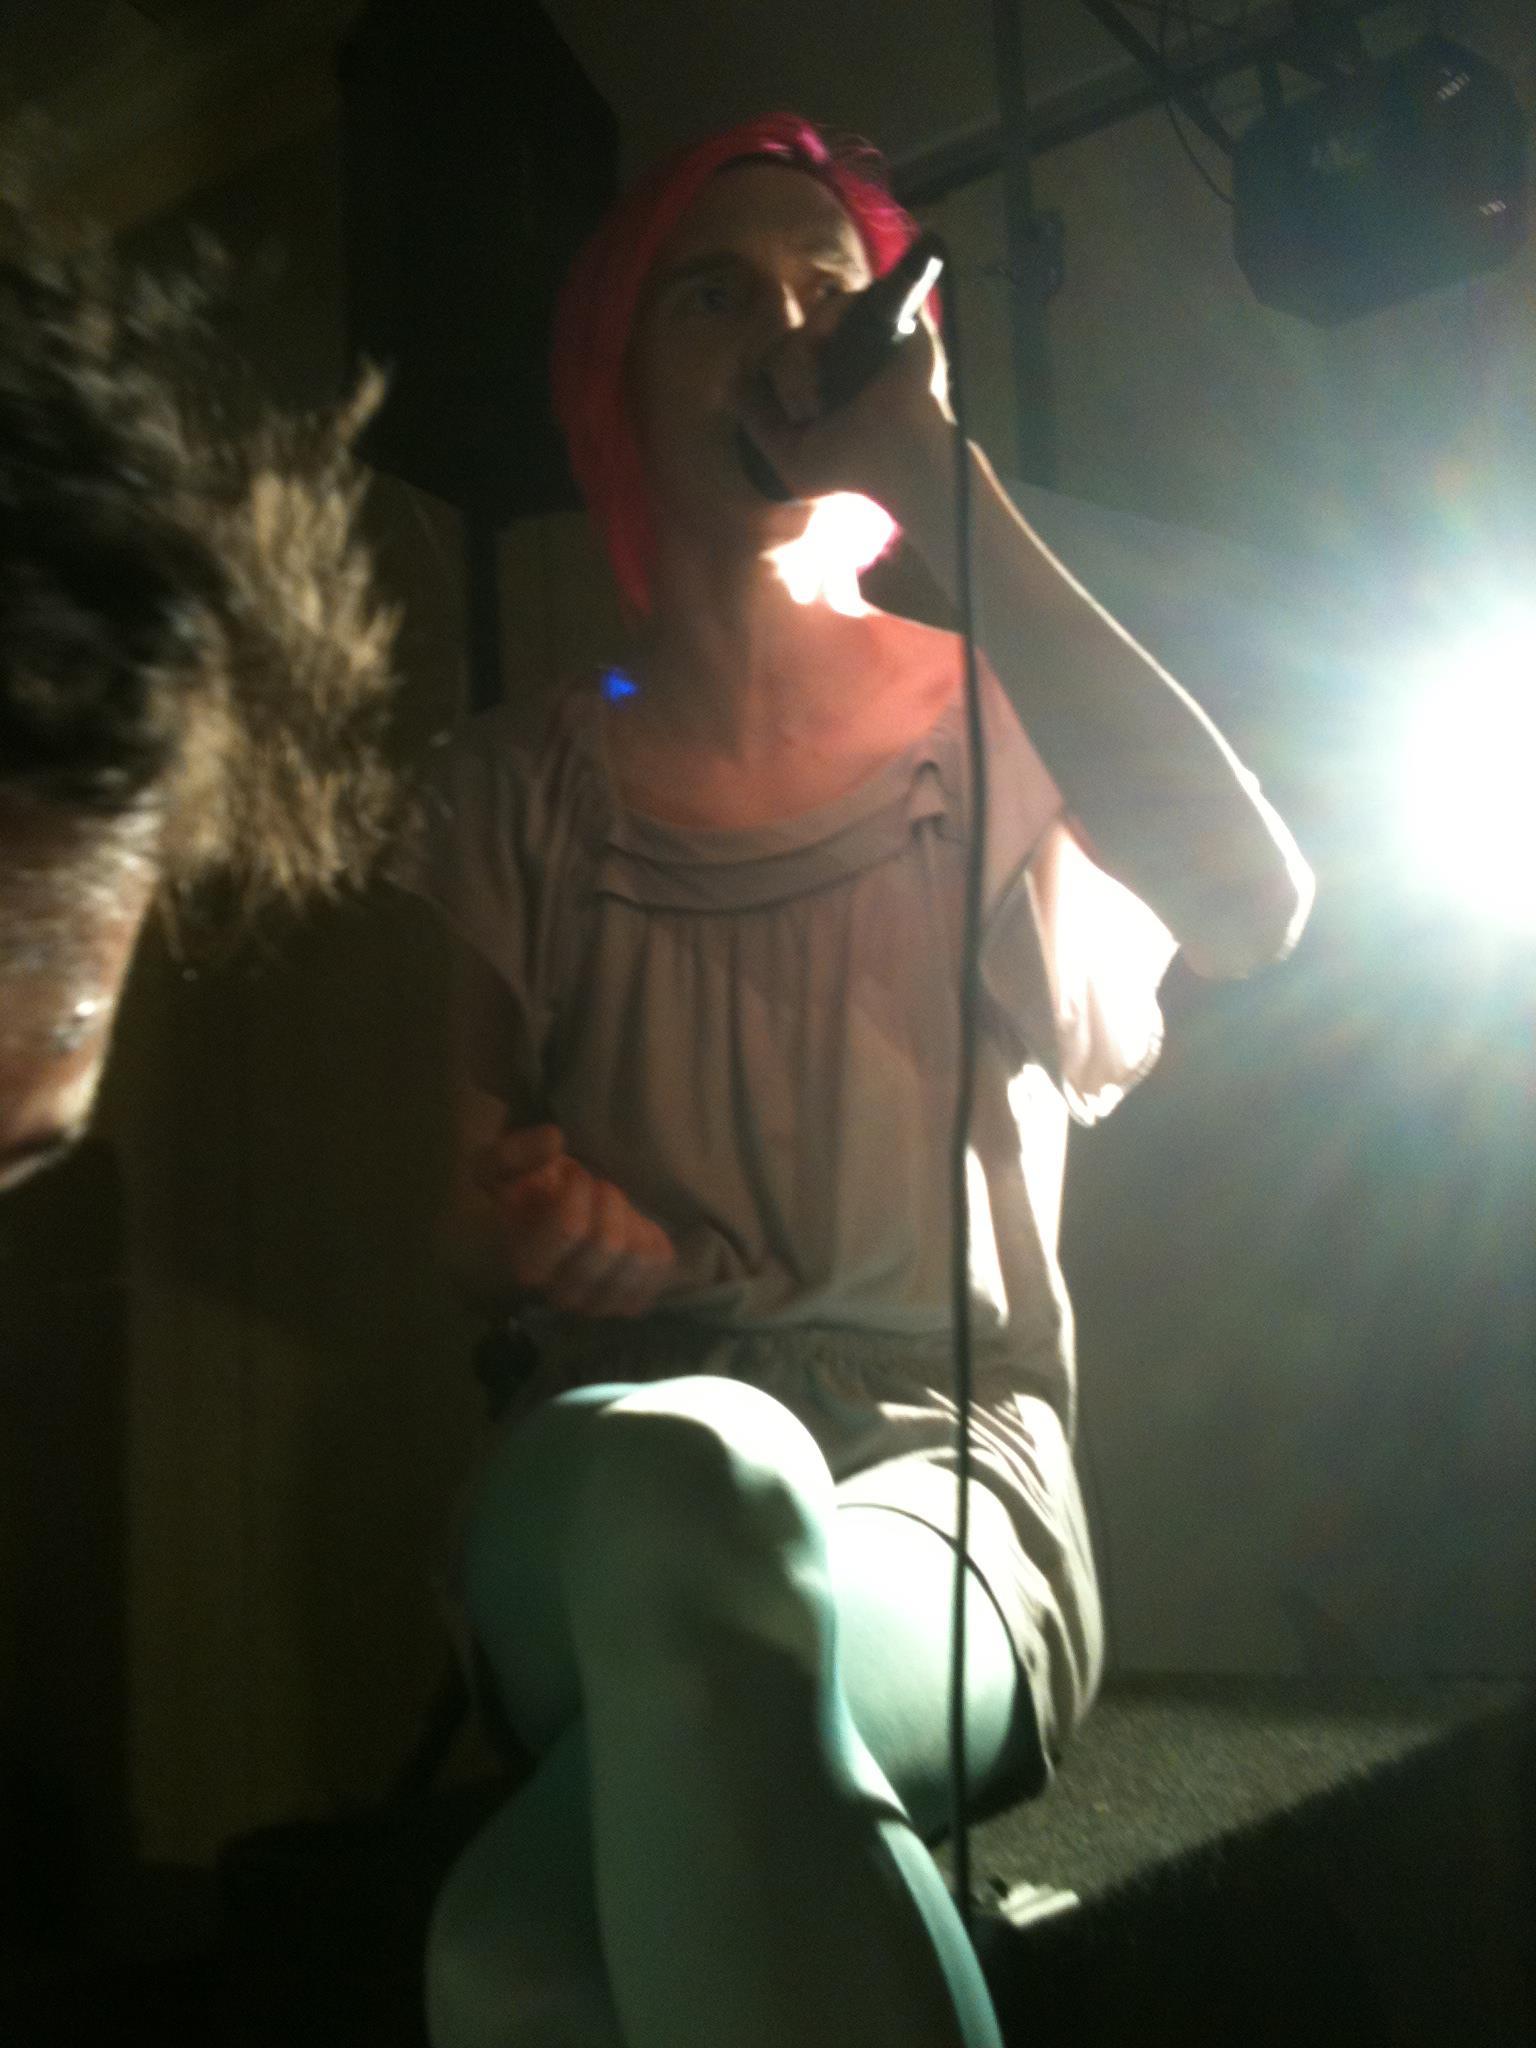 Robbi, bathed in celestial radiance. Photo by Amanda Manzanares